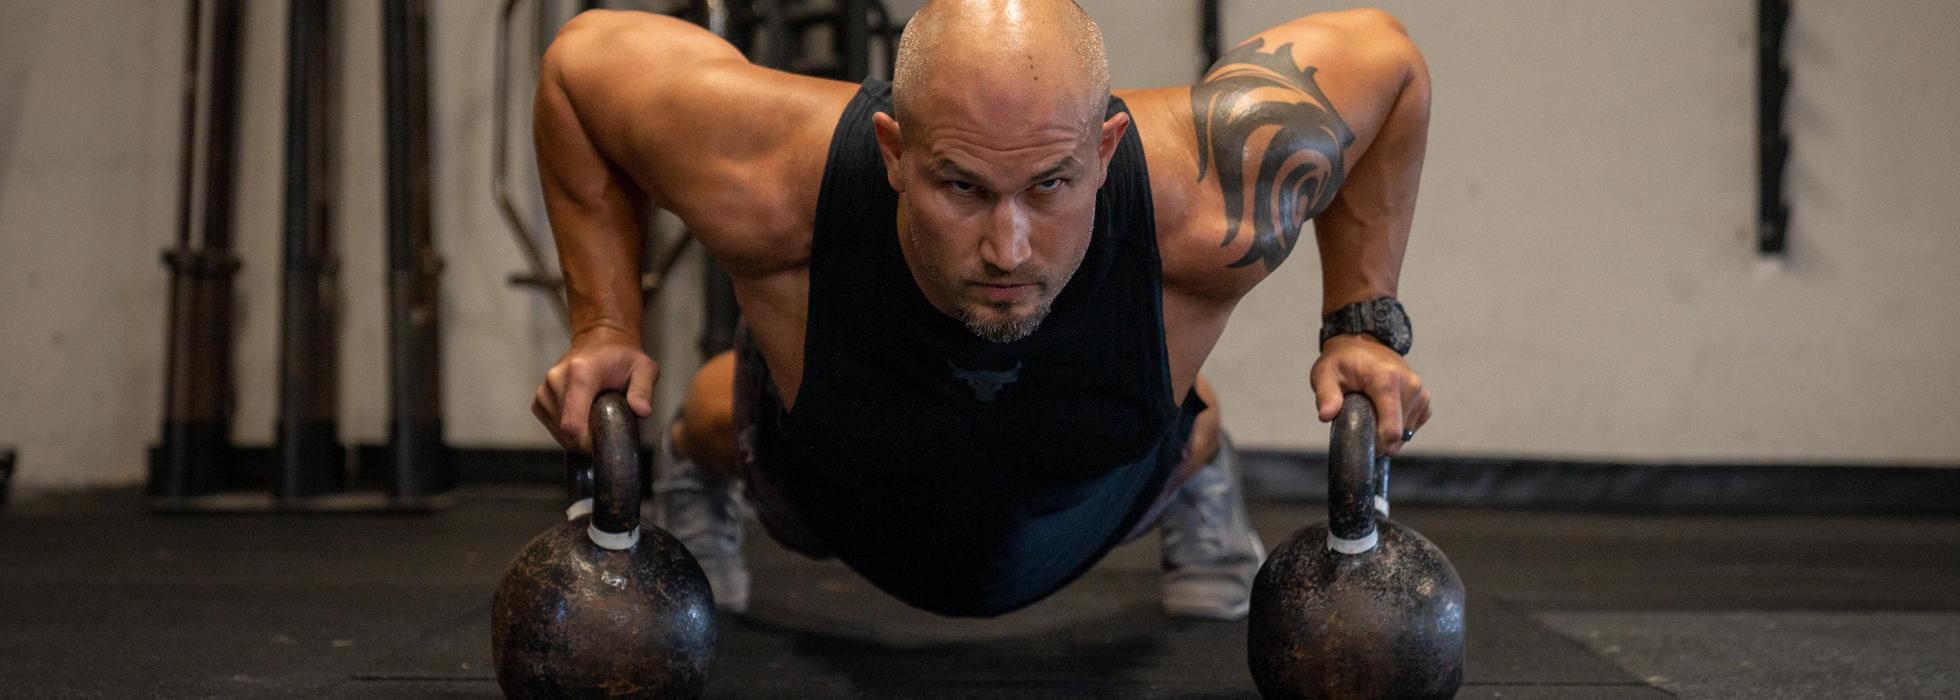 OnlineFit with CrossFit Point Break offering Online Classes